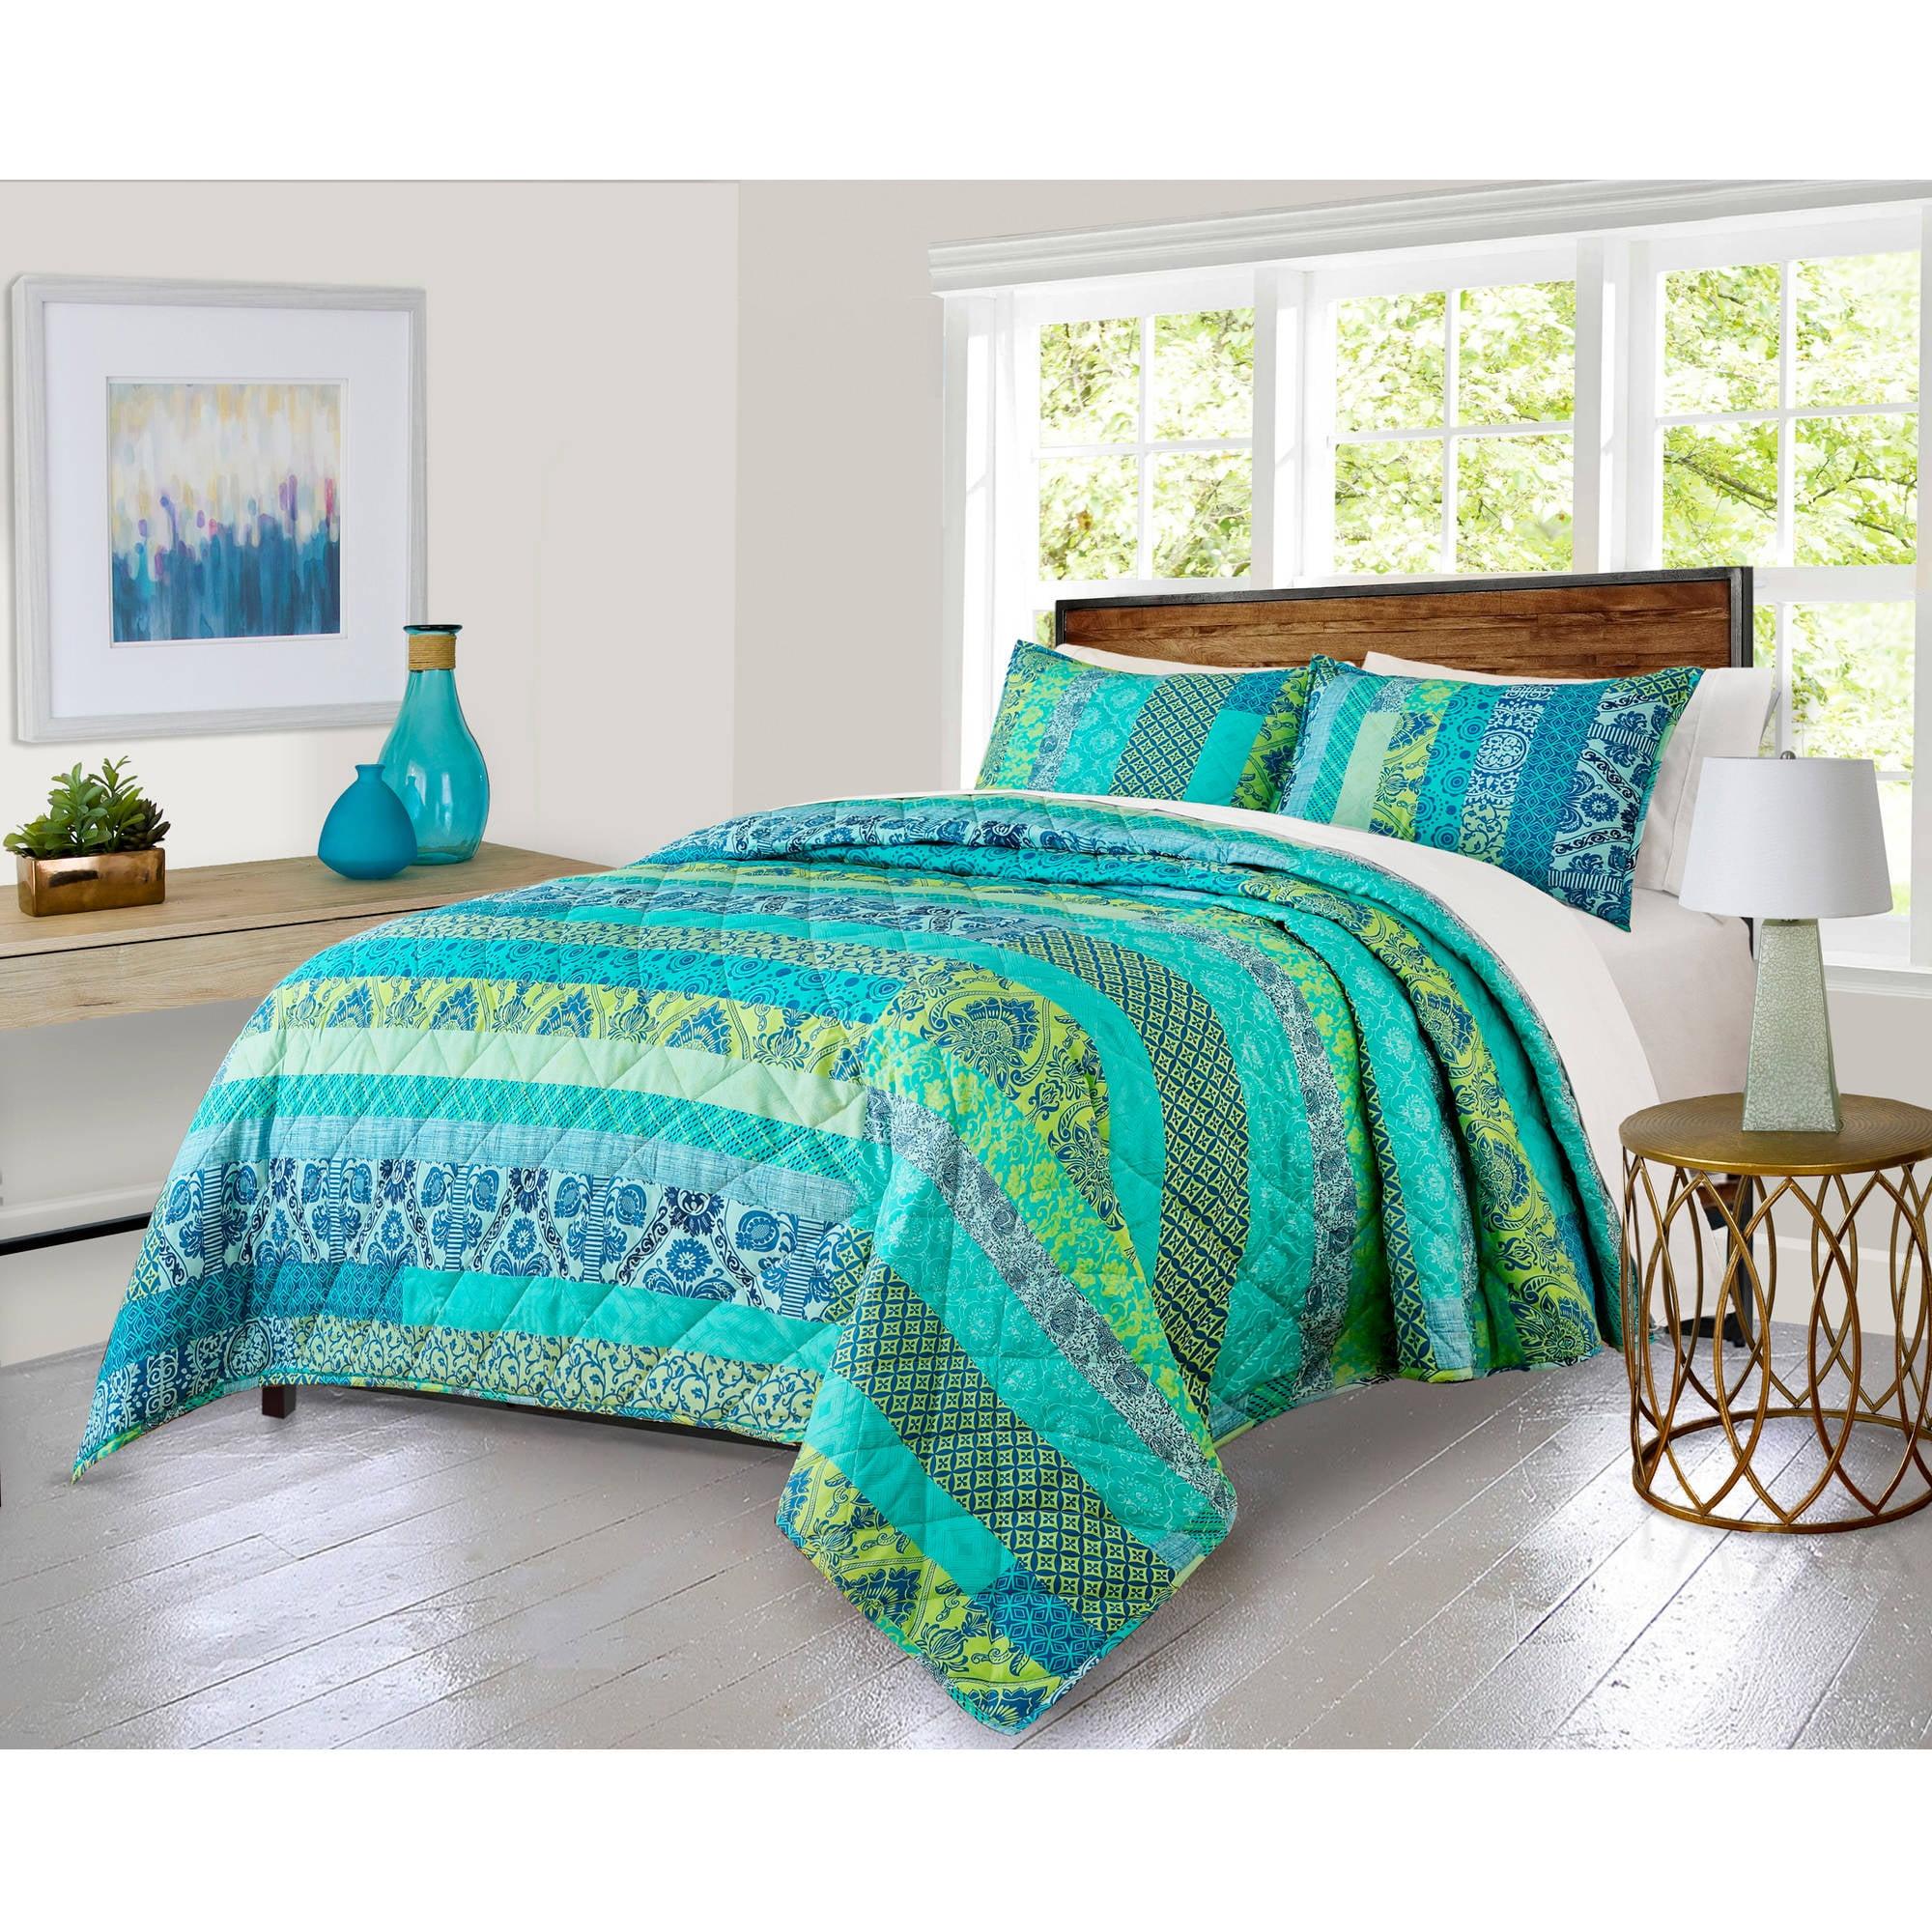 Softesse Allan Mini Quilt Bedding Set